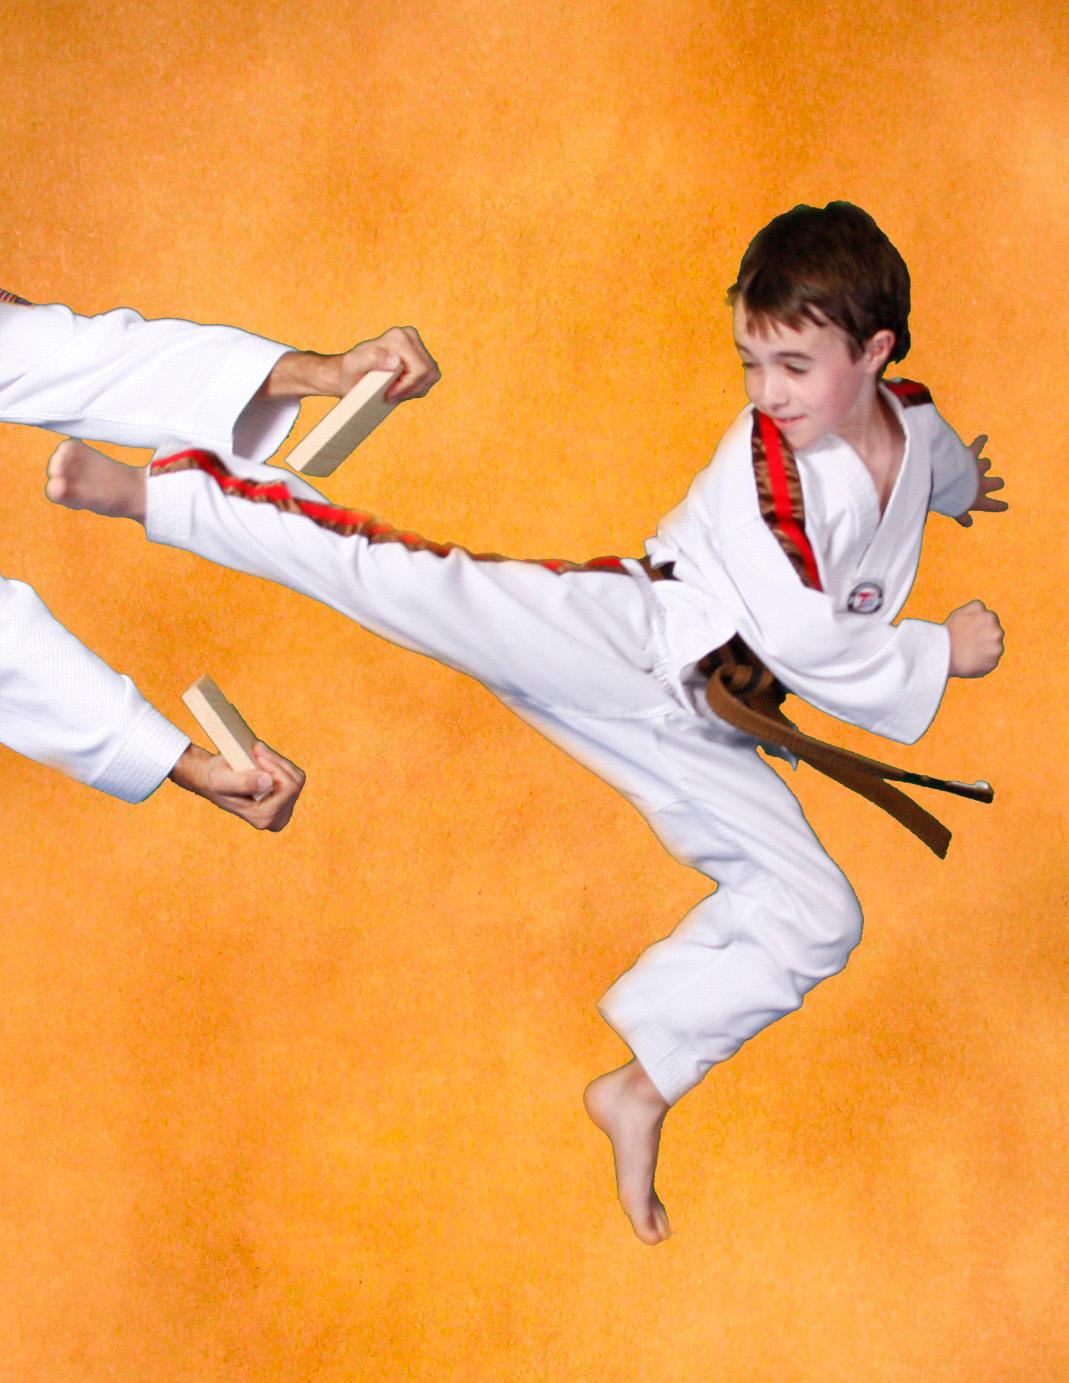 Millennium Martial Arts - Tae Kwon Do image 3